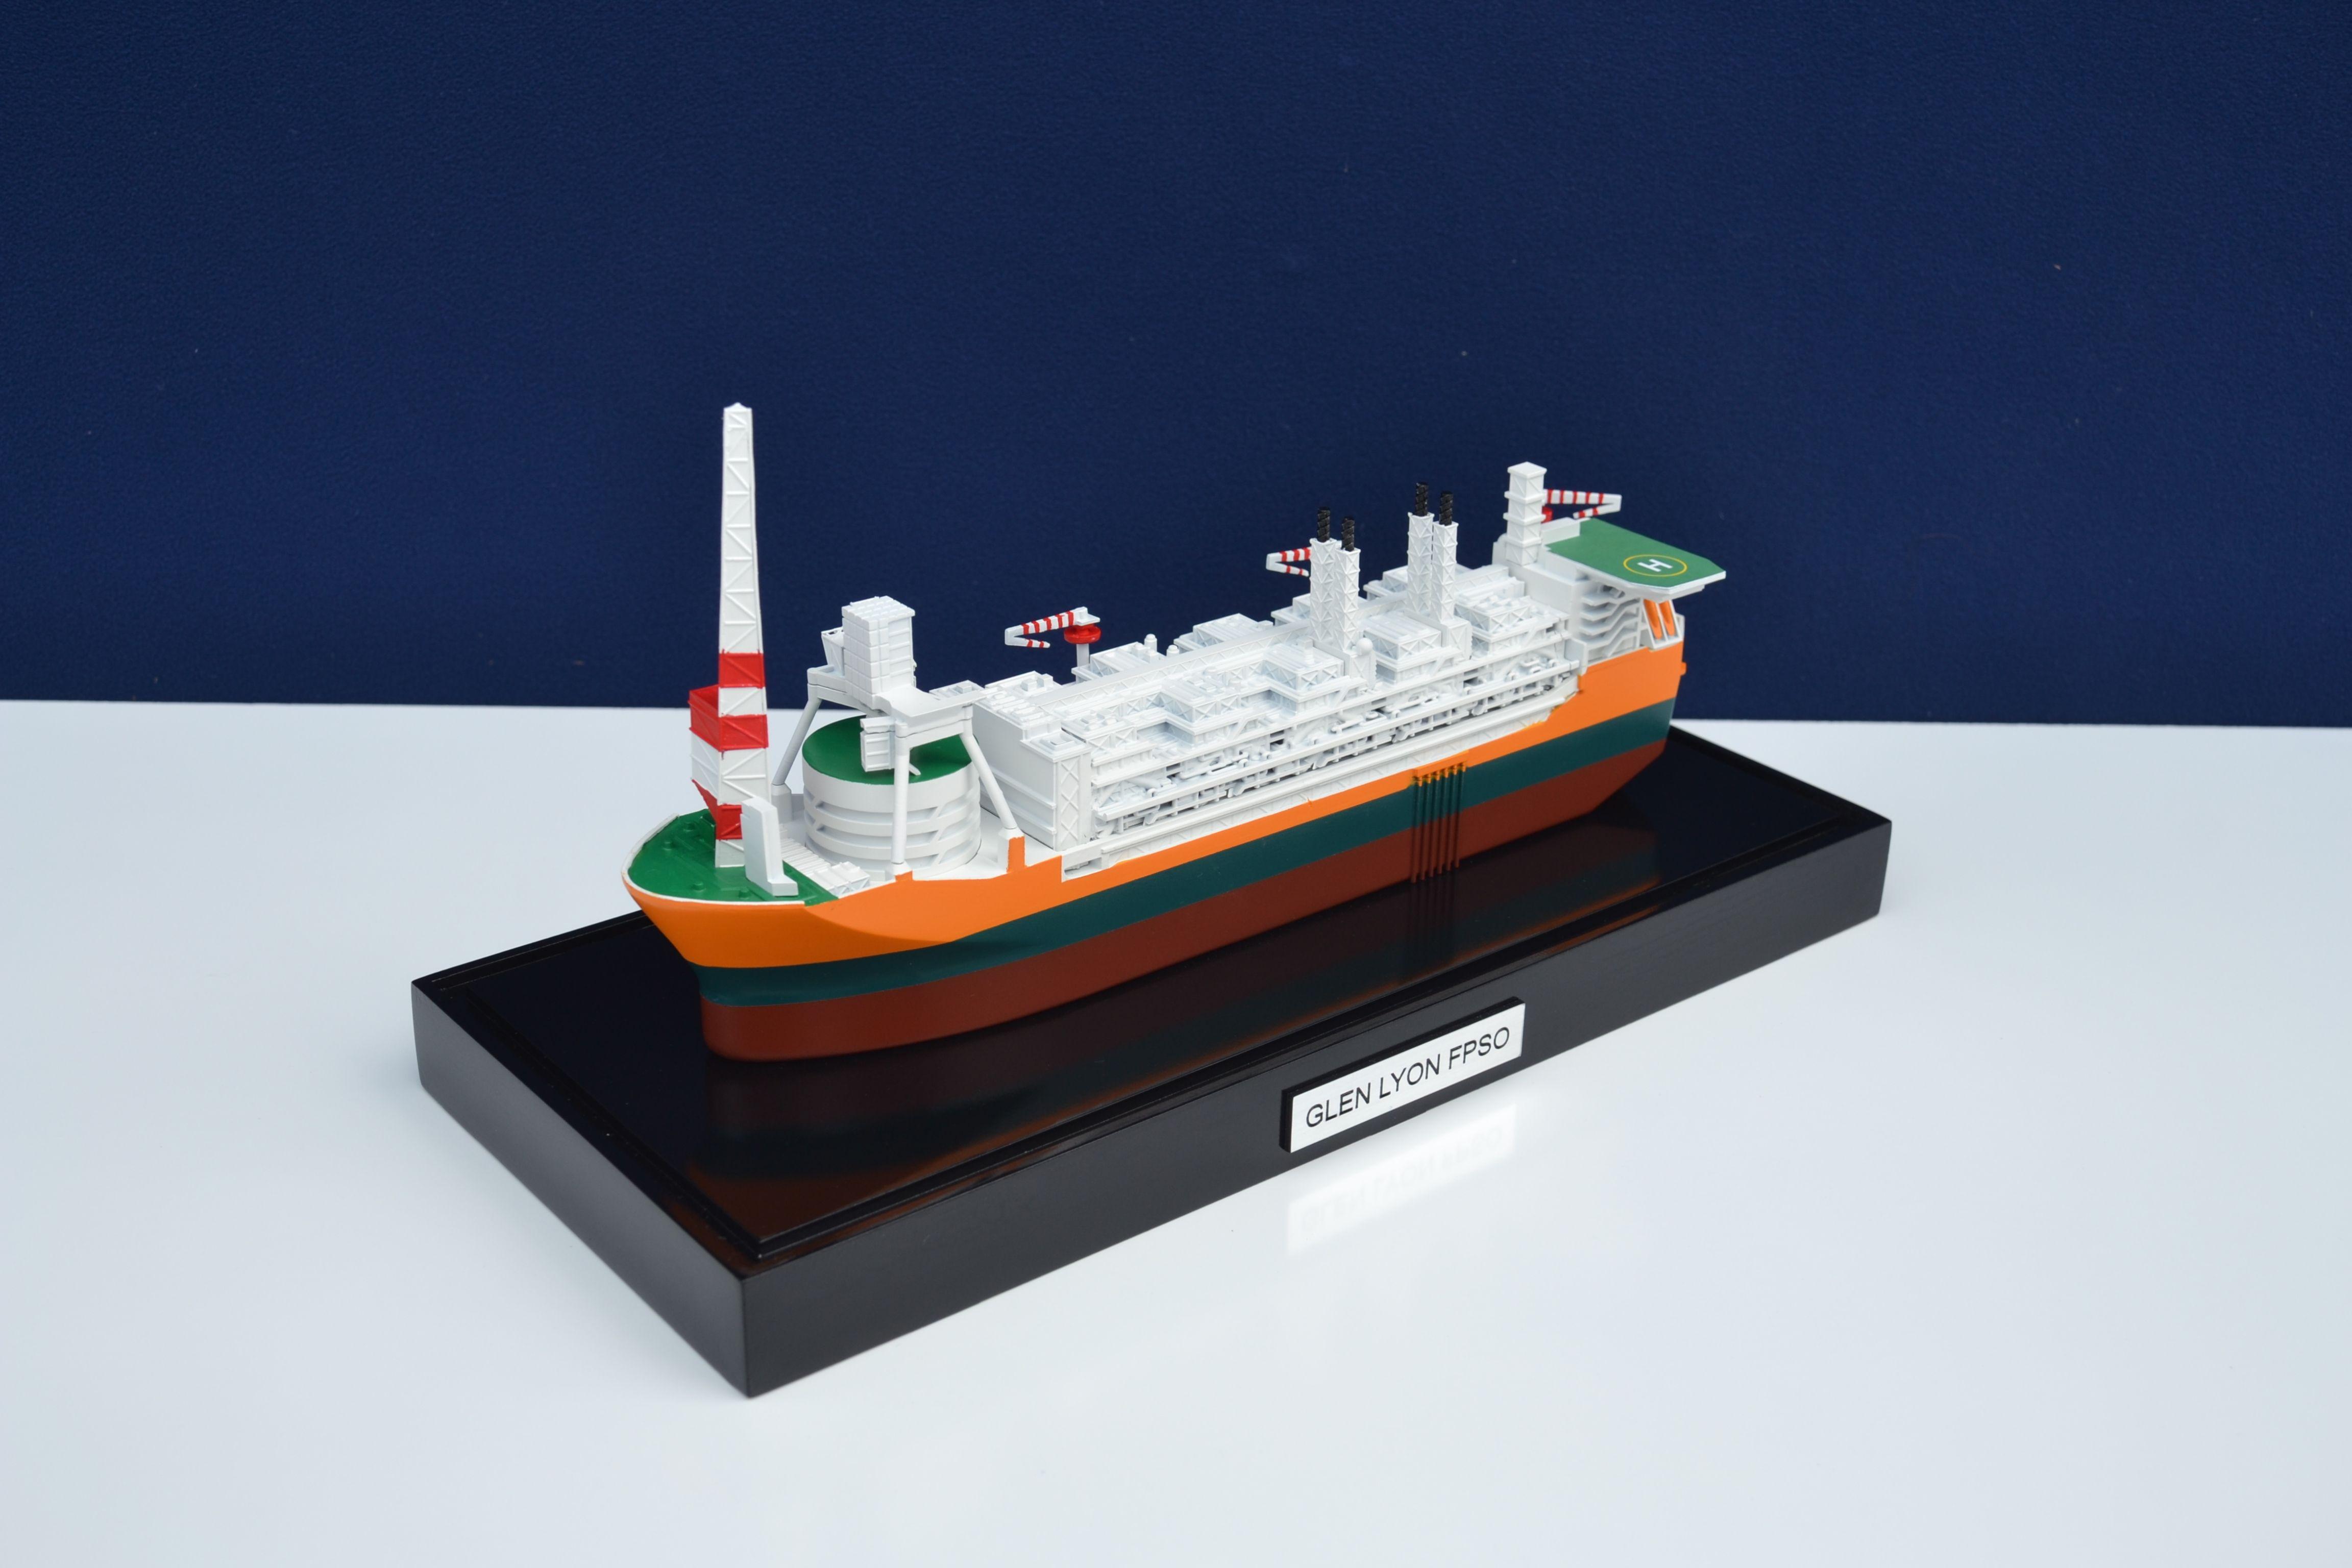 1857-11112-Glen-Lyon-FPSO-Mini-Modele